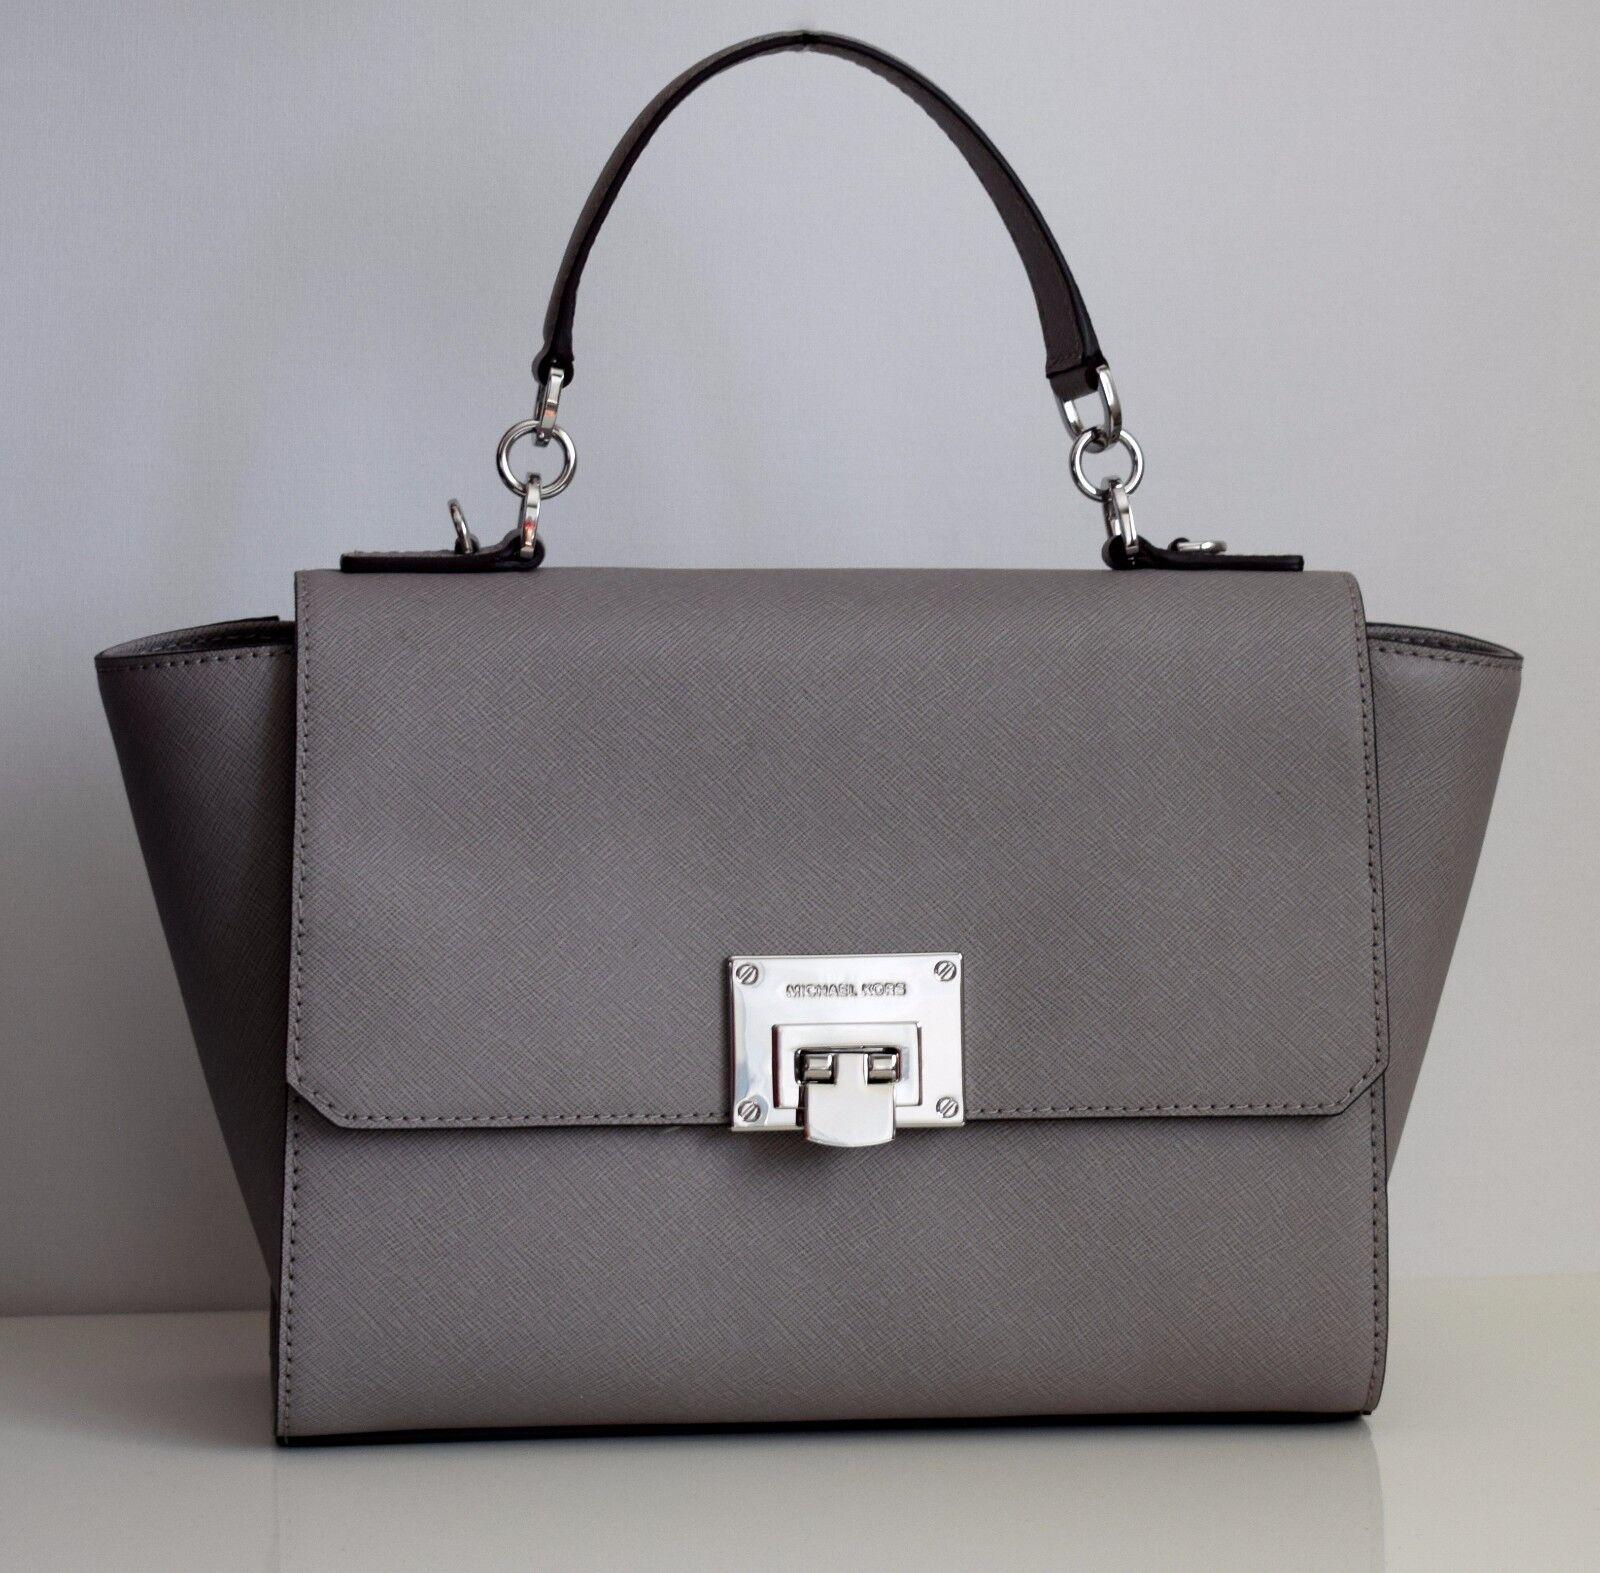 Женская сумка MICHAEL KORS Damen Tasche TINA pearl grey Leder MD TH SATCHEL